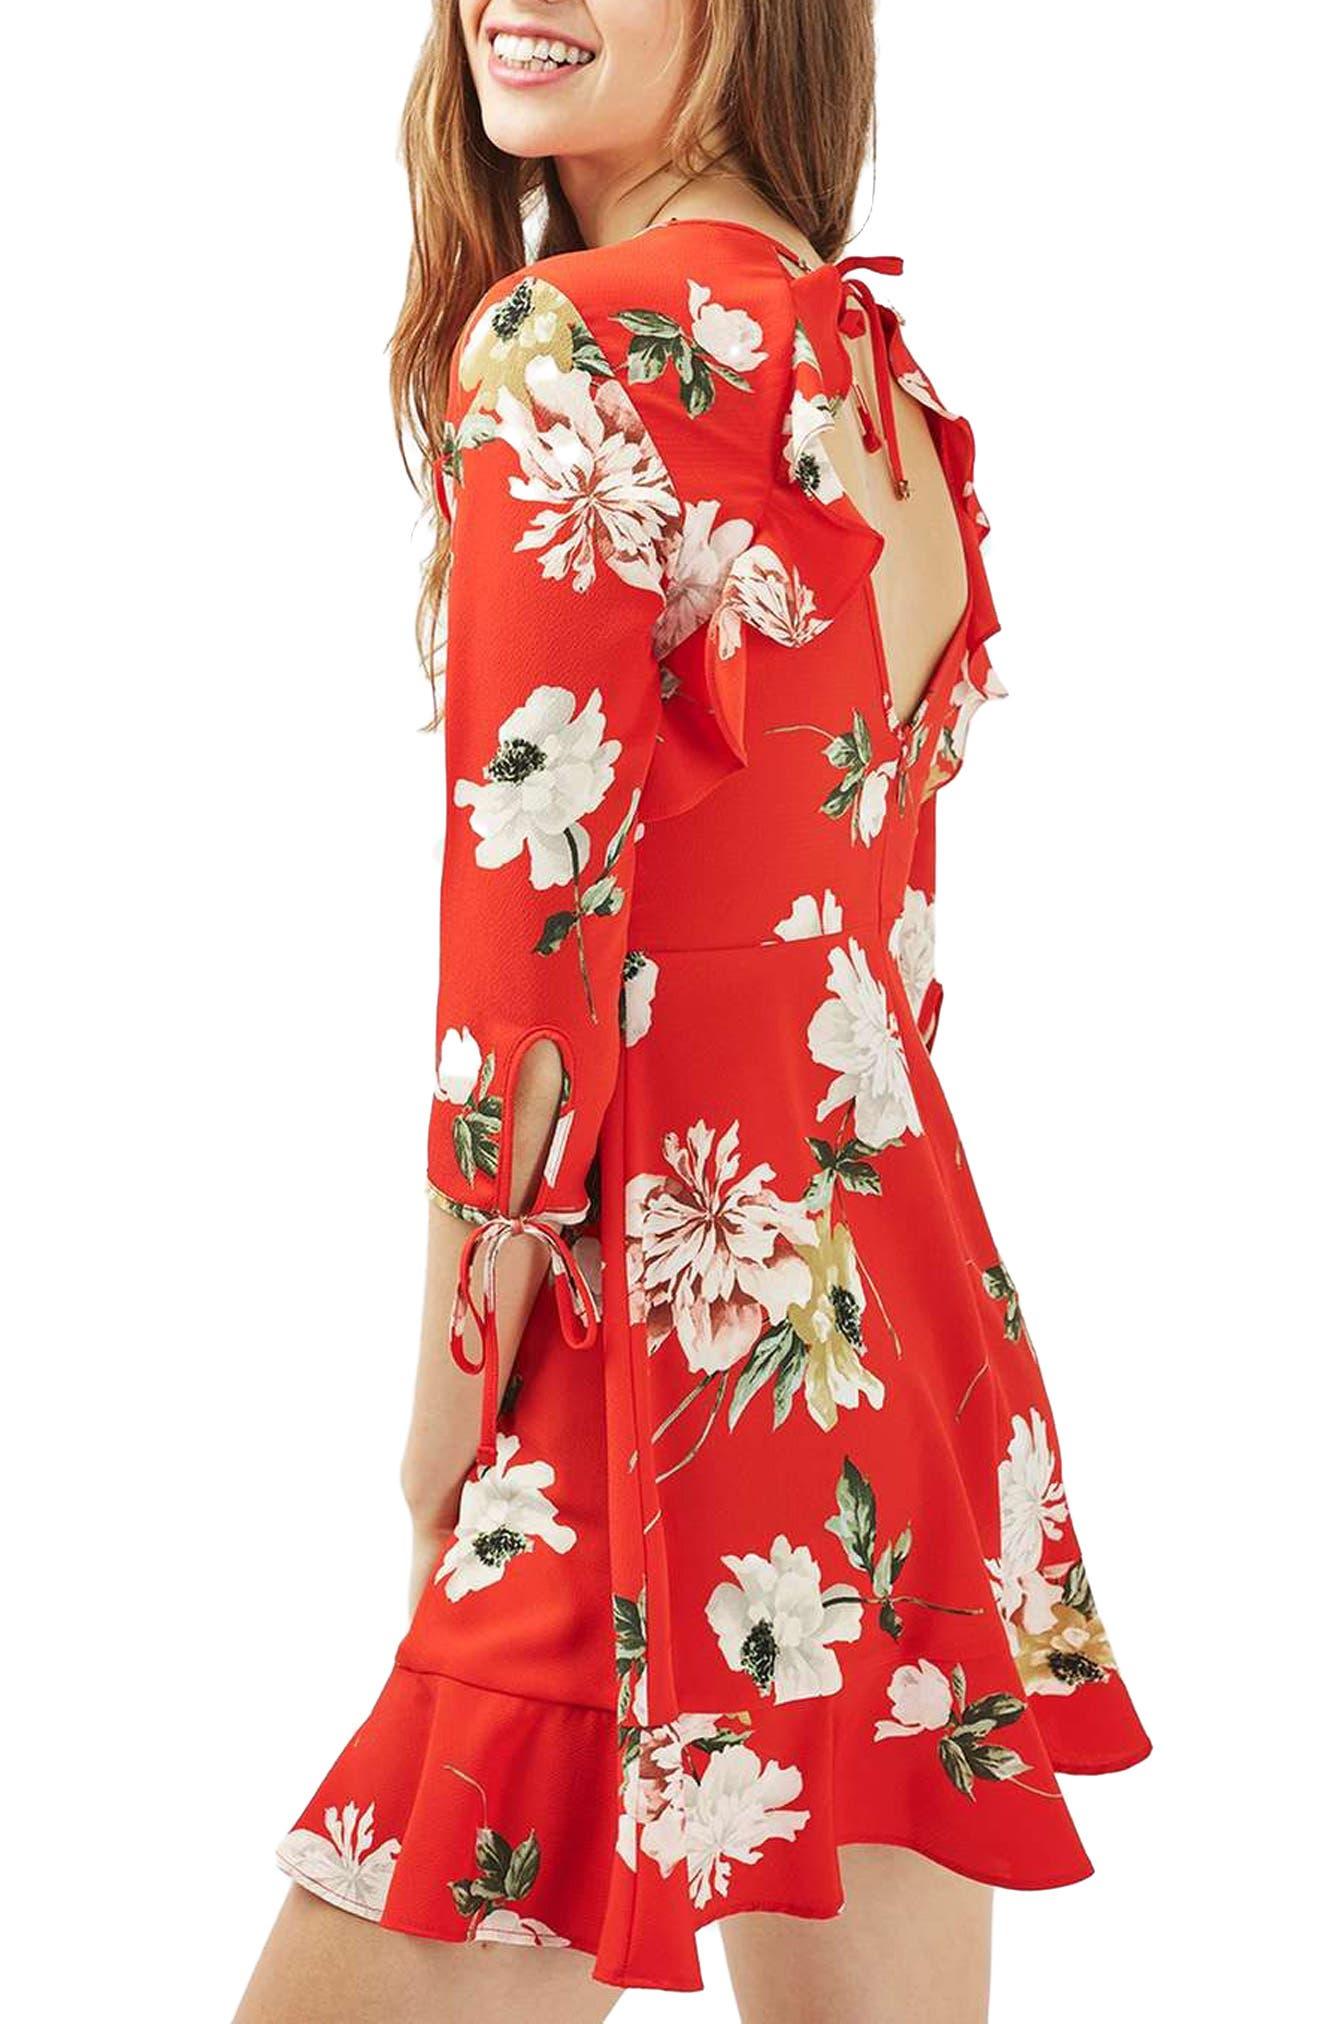 Ruffle Floral Tea Dress,                             Alternate thumbnail 3, color,                             Red Multi